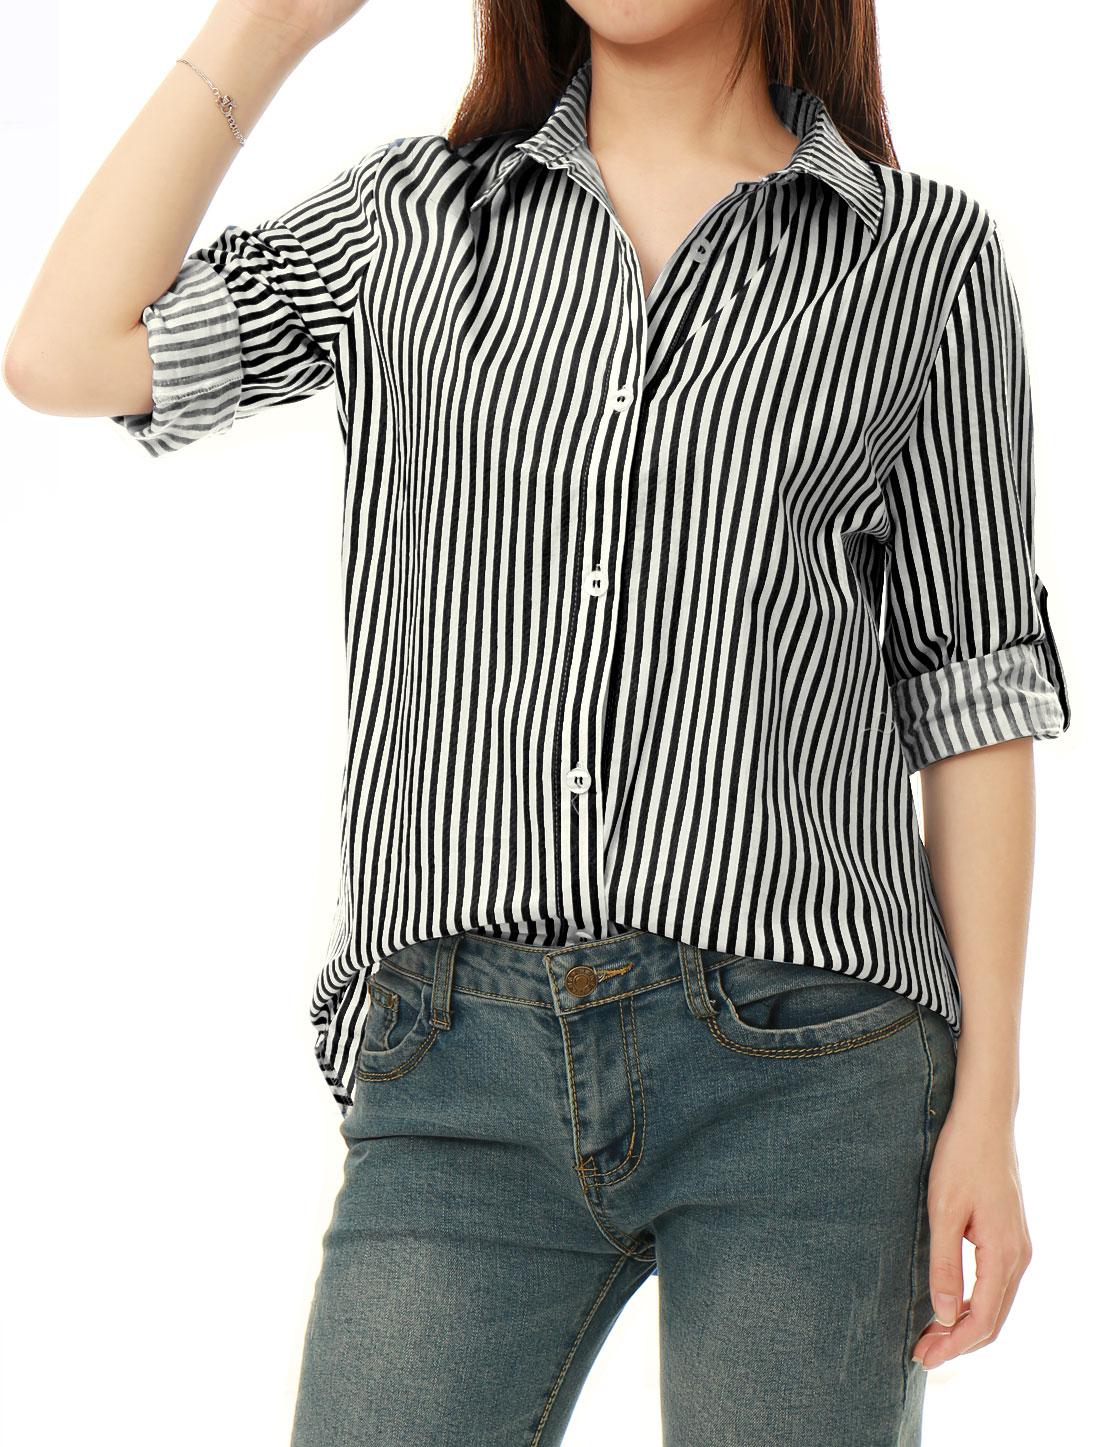 Allegra K Women Striped High Low Hem Roll Up Sleeves Shirt Black White M